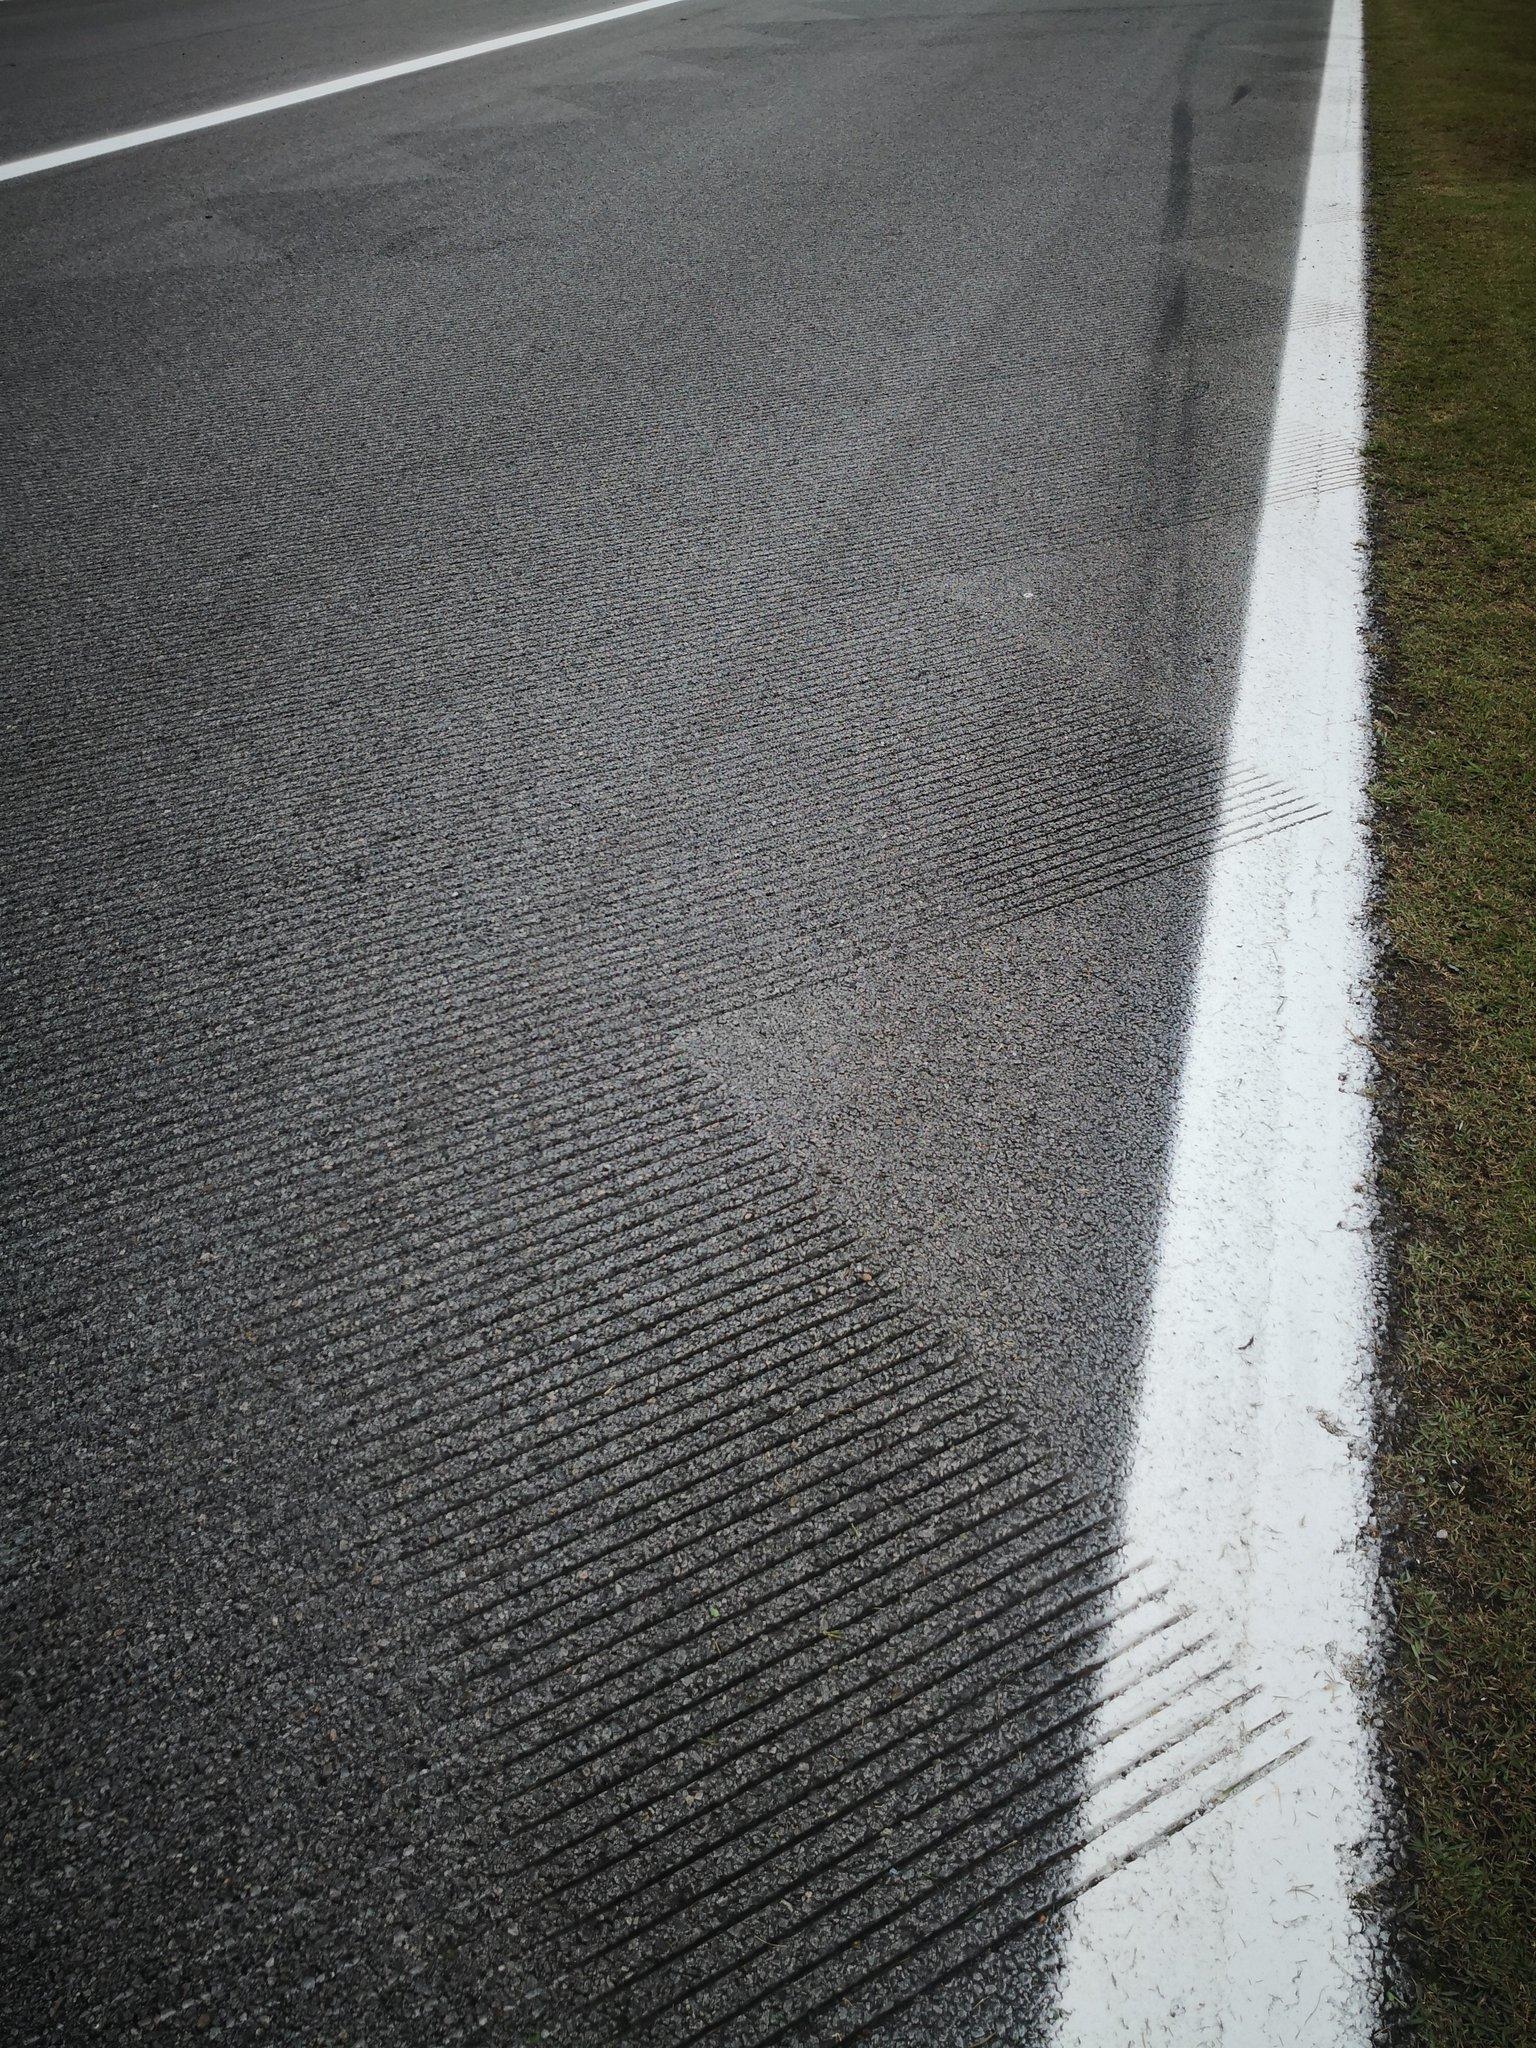 [F1 2018] GP del Brasile - Interlagos-drefzrfxgaayazj.jpg-orig.jpg